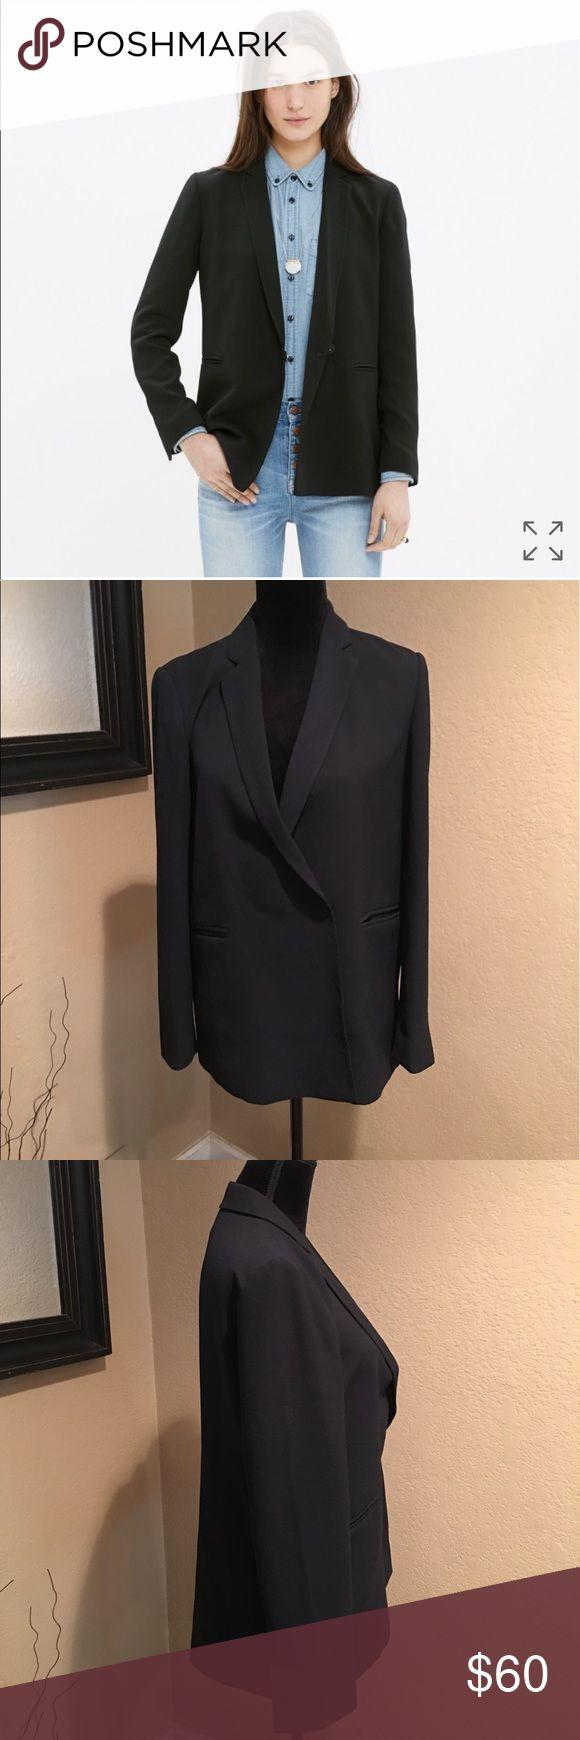 Madewell. Boy blazer Super cute Blazer!  Pre owned. Great condition! Madewell Jackets & Coats Blazers